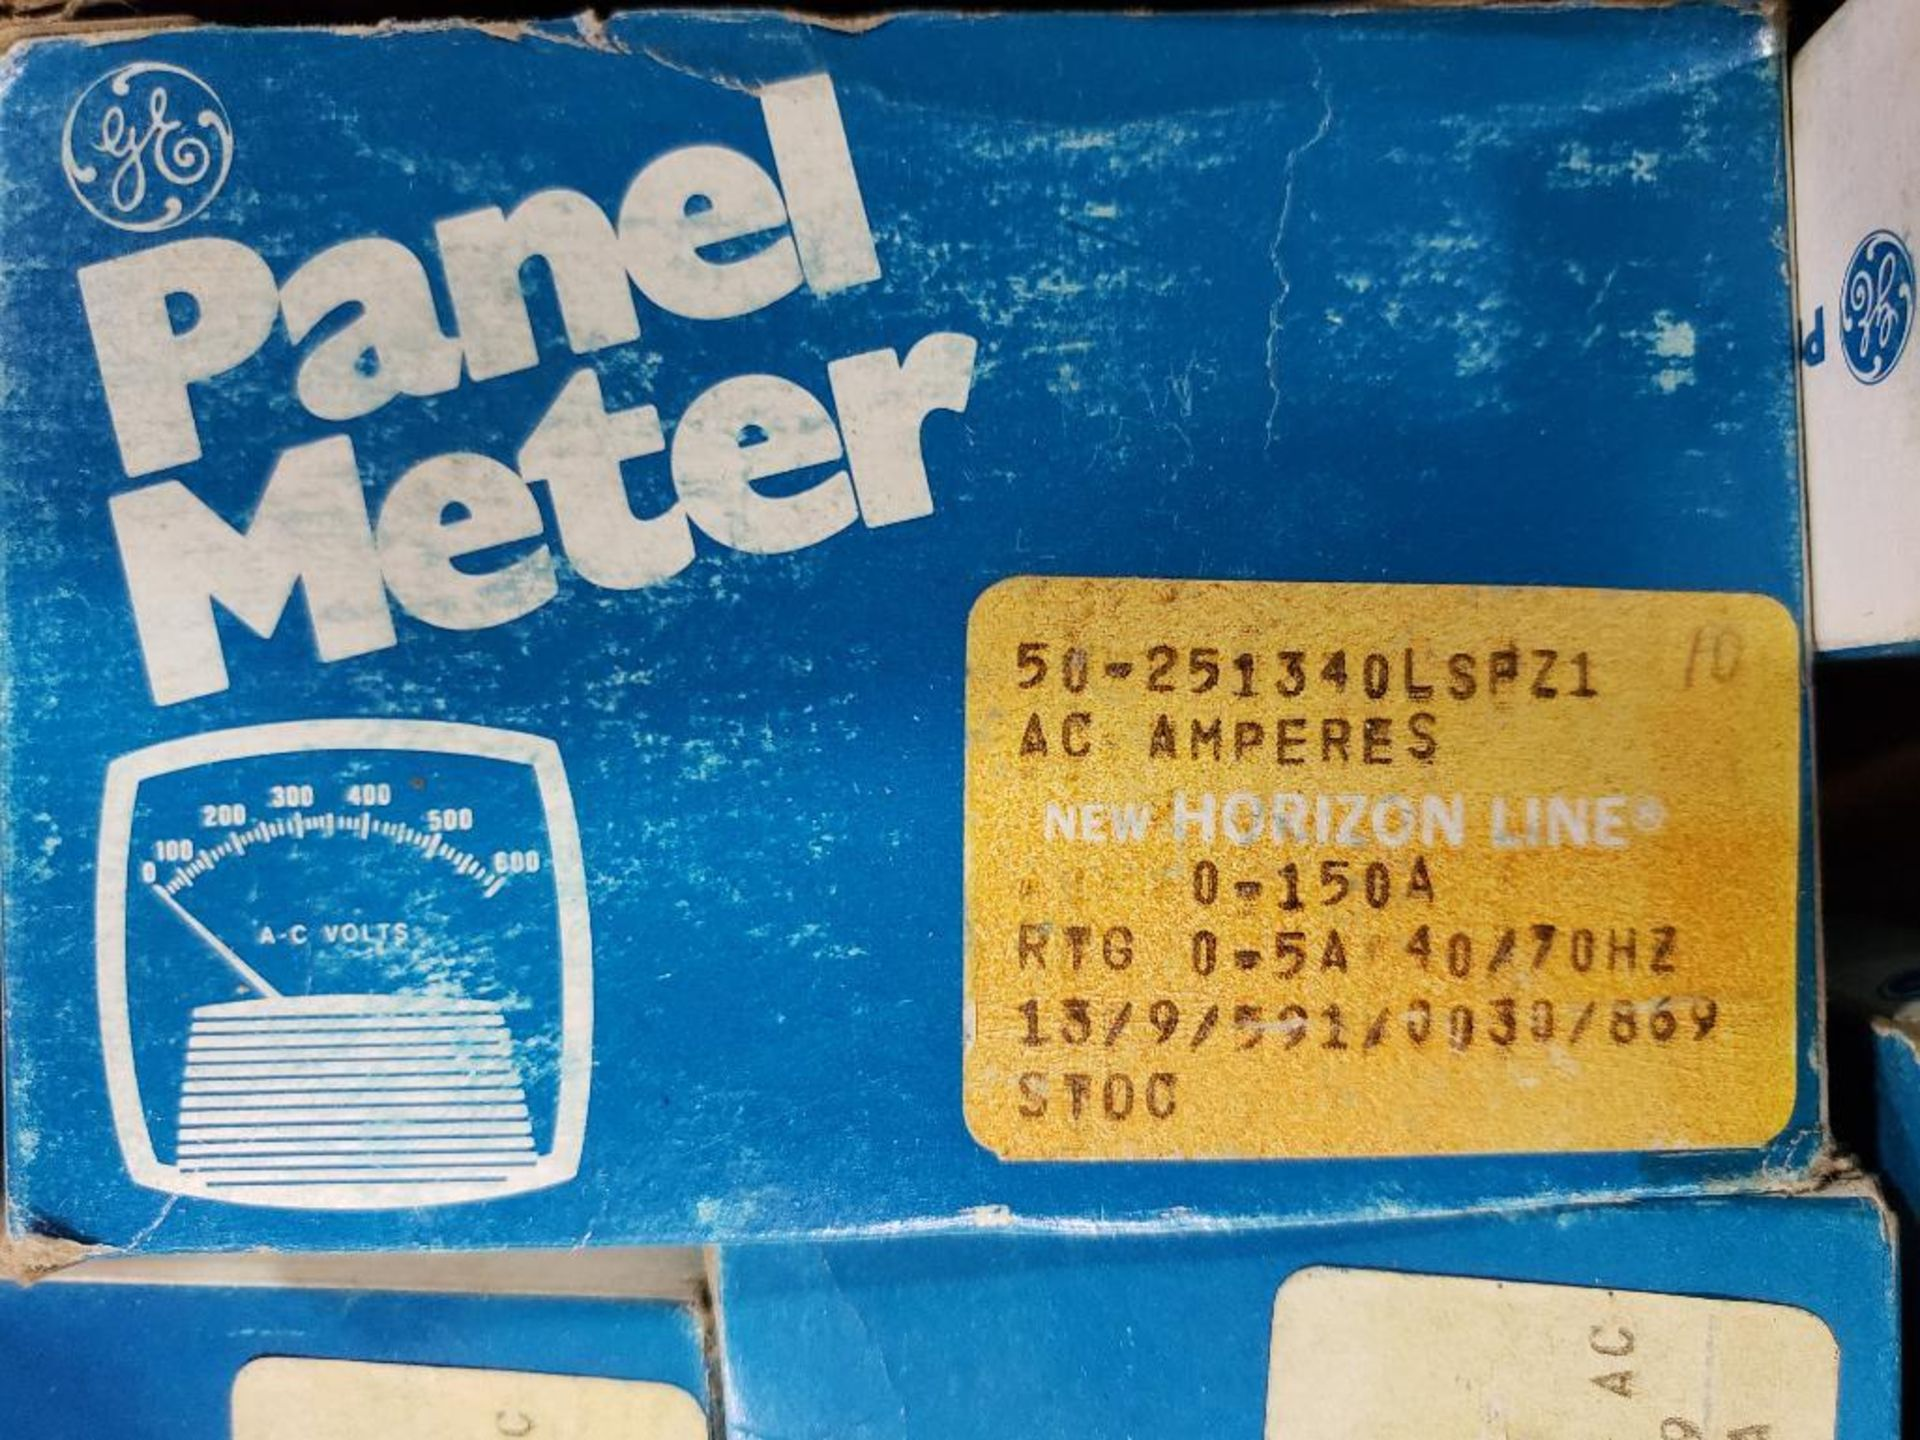 Assorted panel meters. Simpson, Panel Meter. - Image 10 of 12